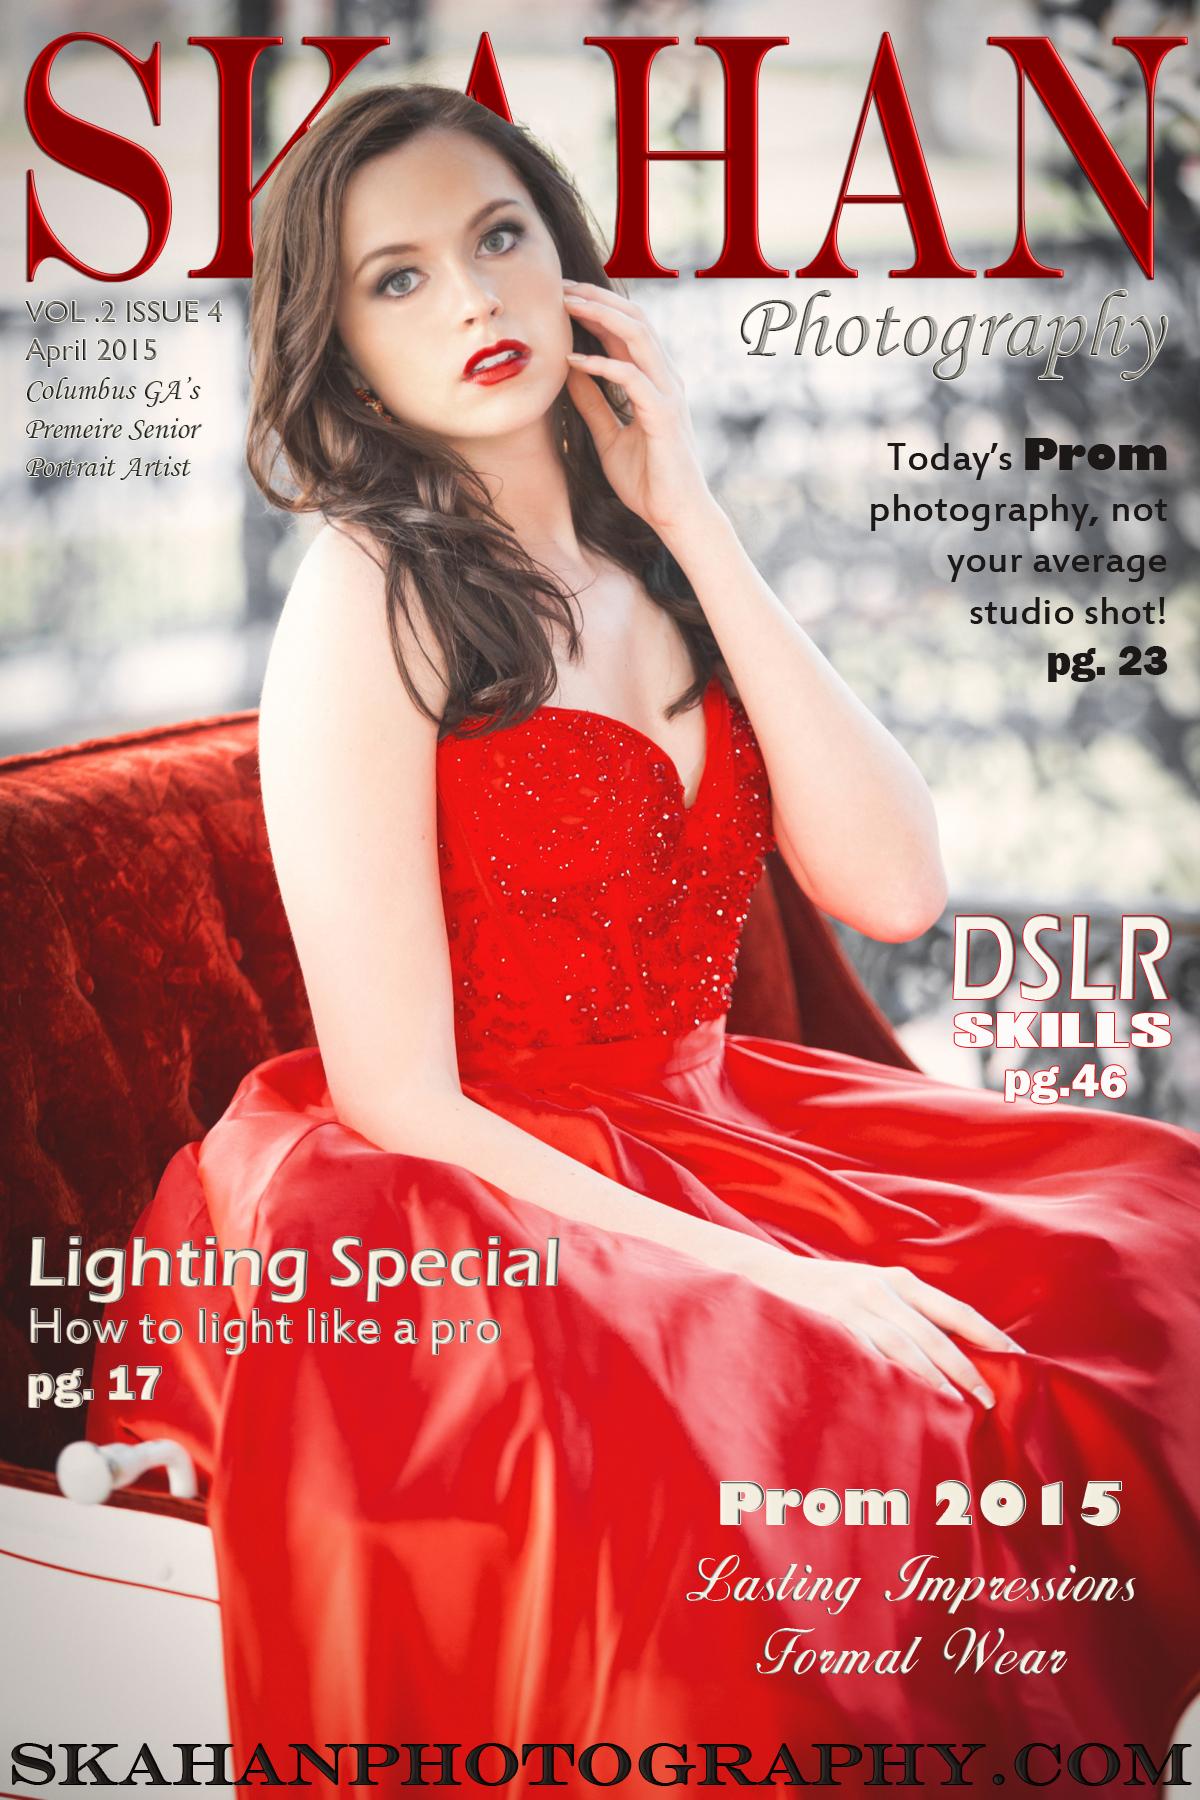 Volume 2 Issue 4 April 2015